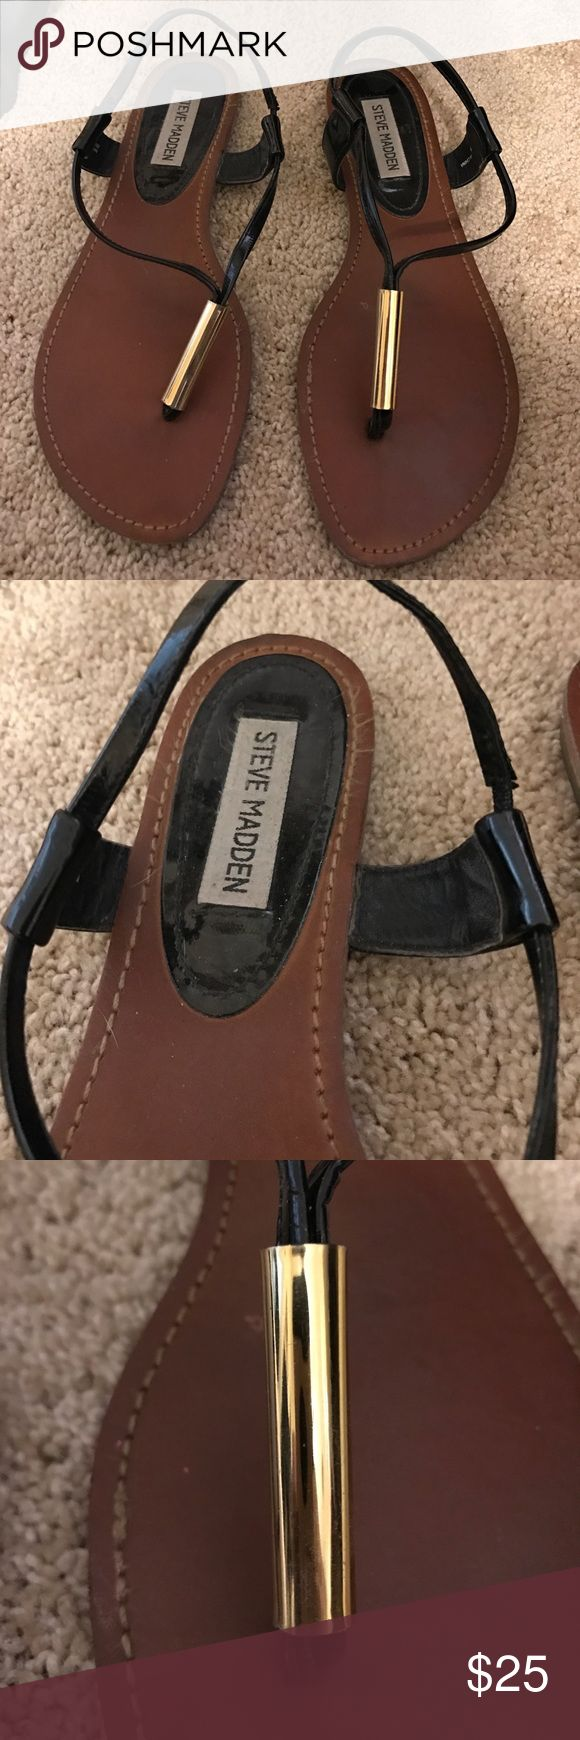 Black sandals gold bar - Steve Madden Sandals 1 Hour Sale Black Patent Leather Sandals With Gold